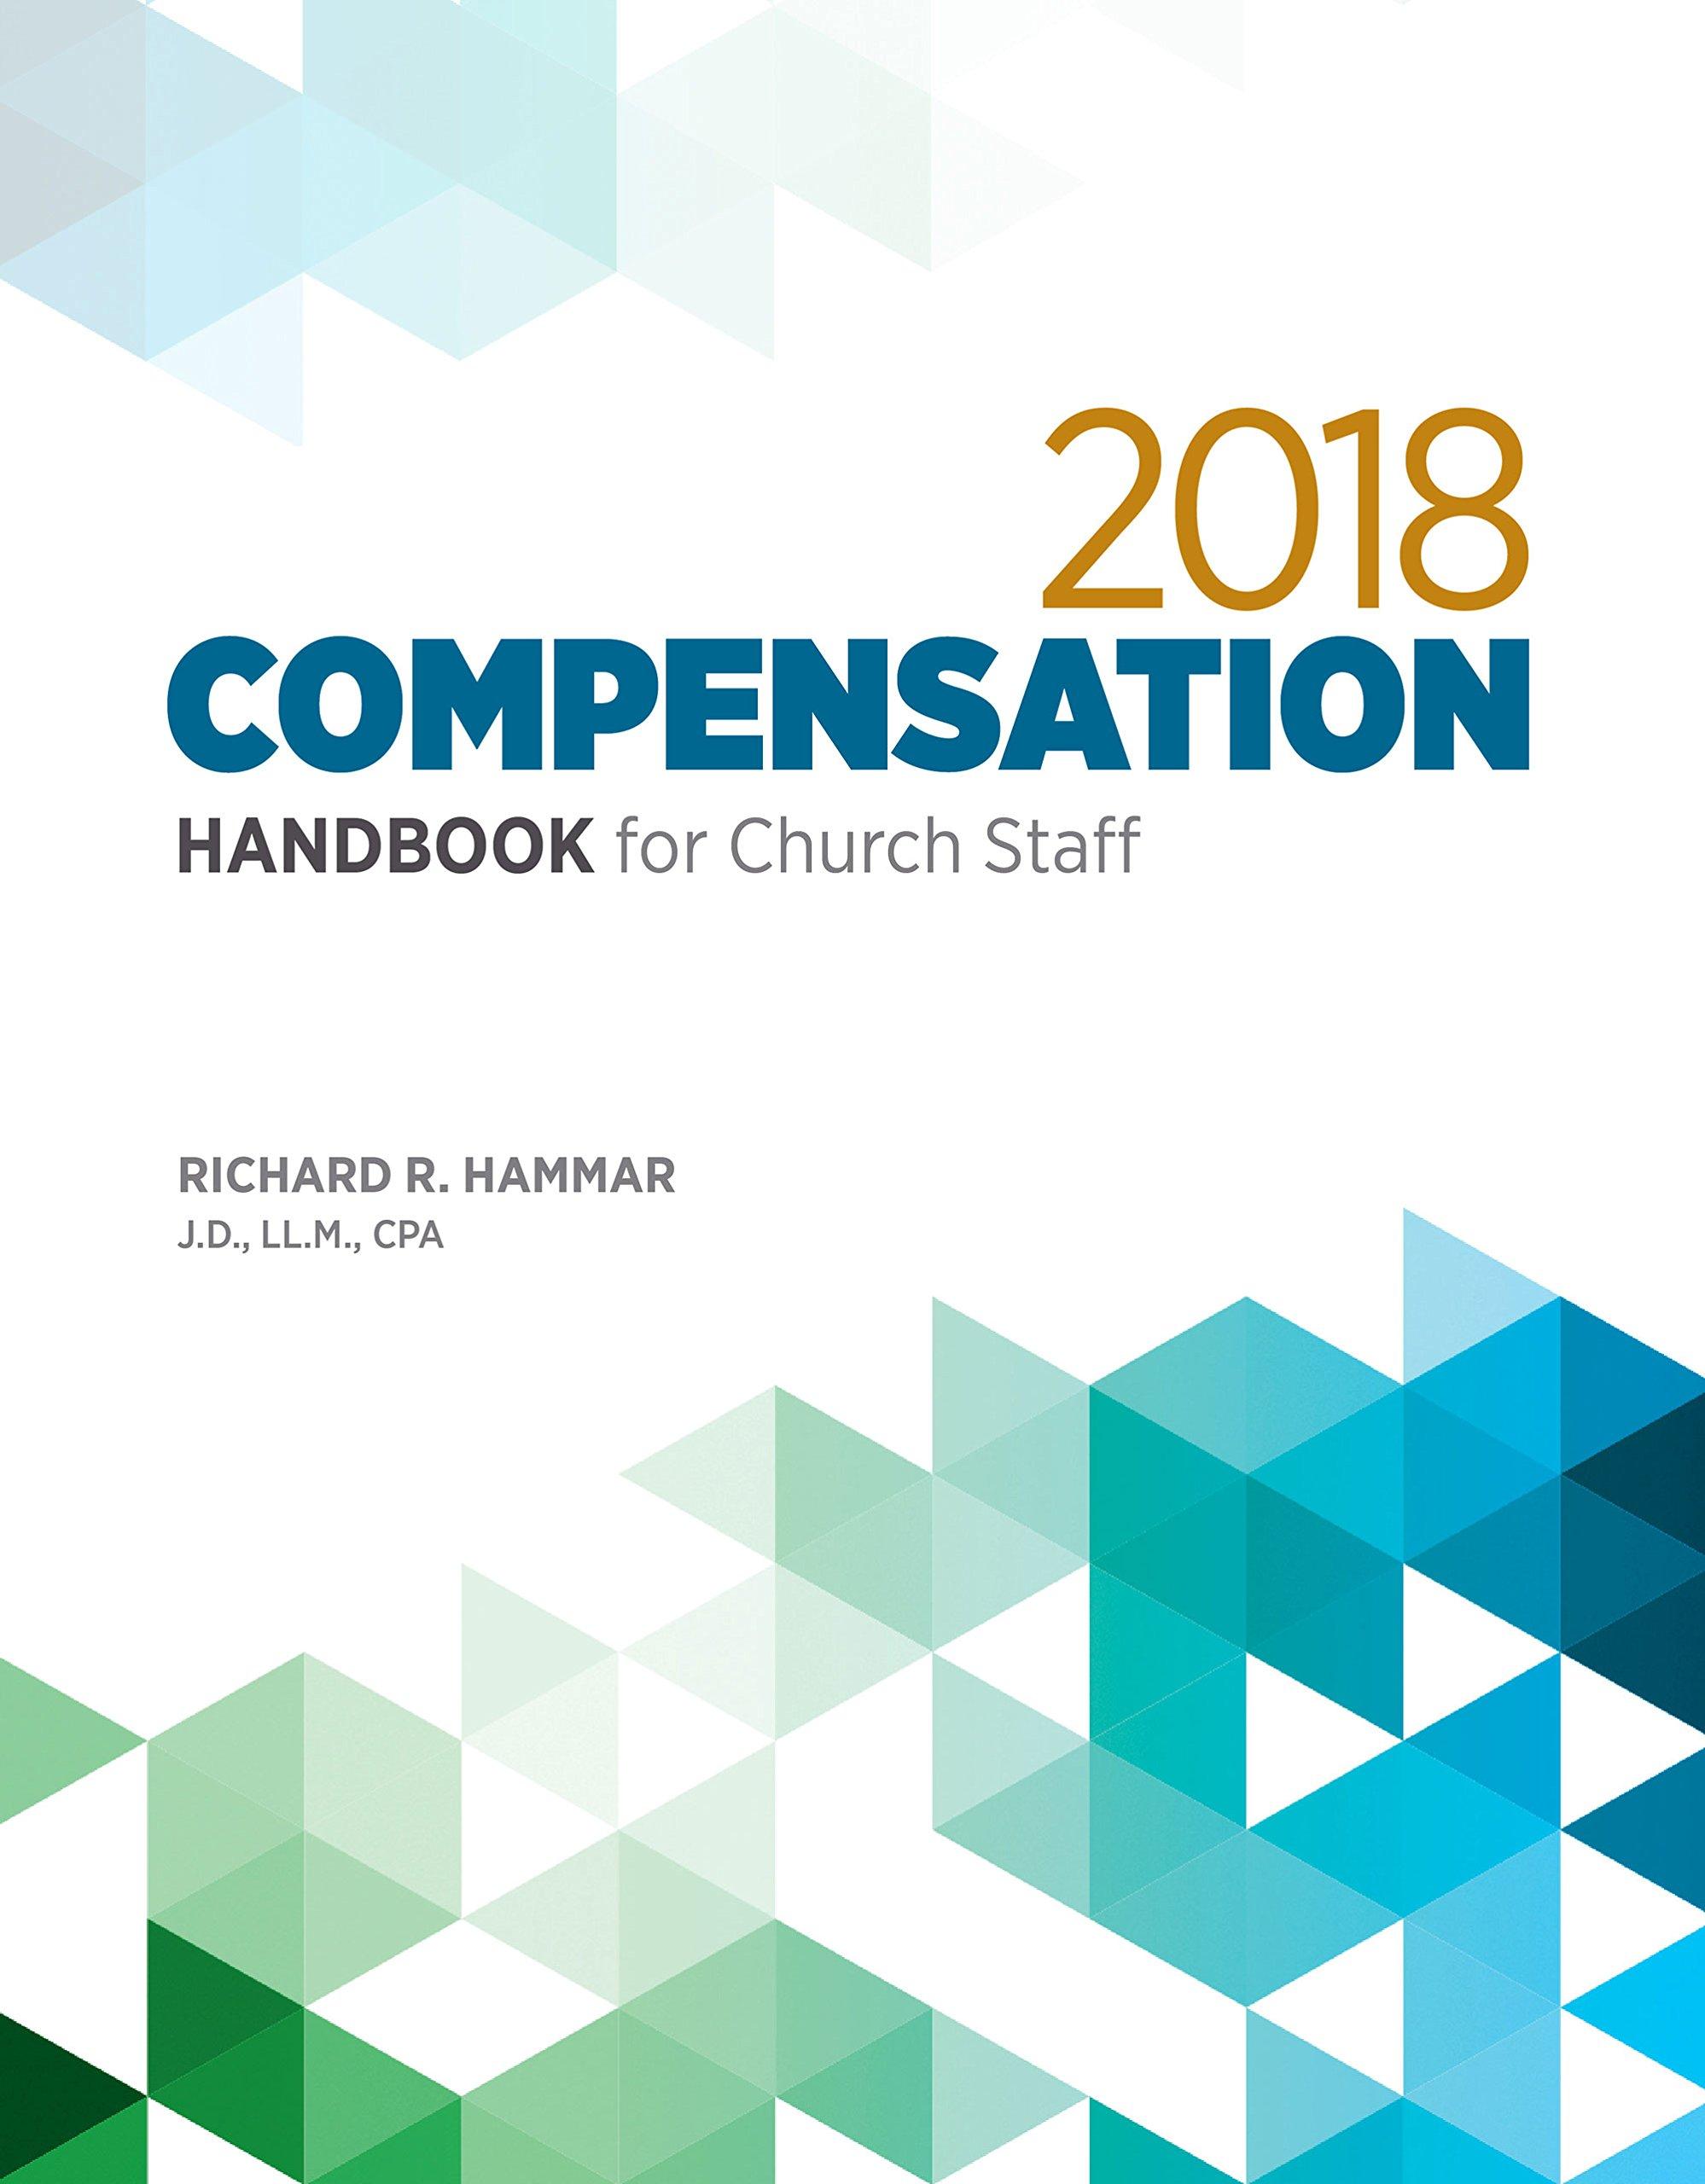 2018 compensation handbook for church staff richard r hammar 710ic4fe6fl 0917463765 church administrator salary church business